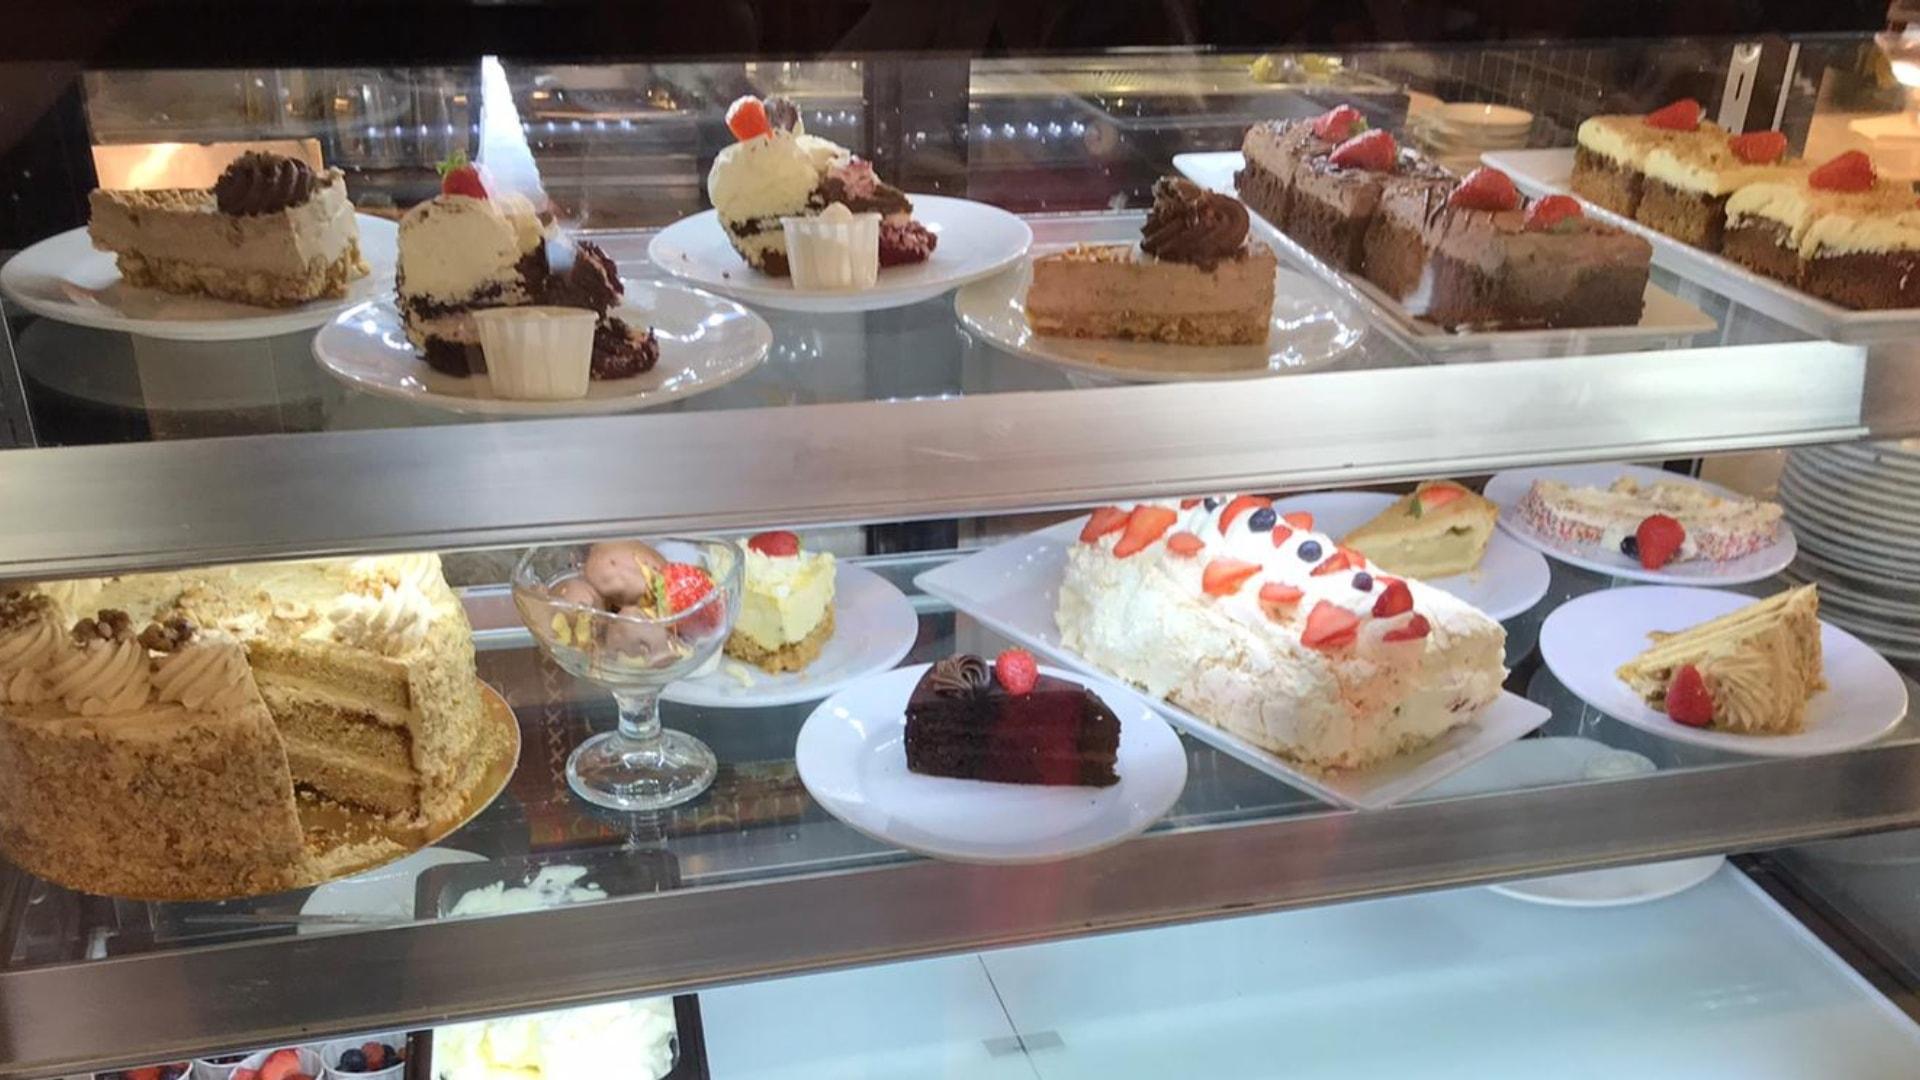 Stradbally Fayre Café & Foodhall